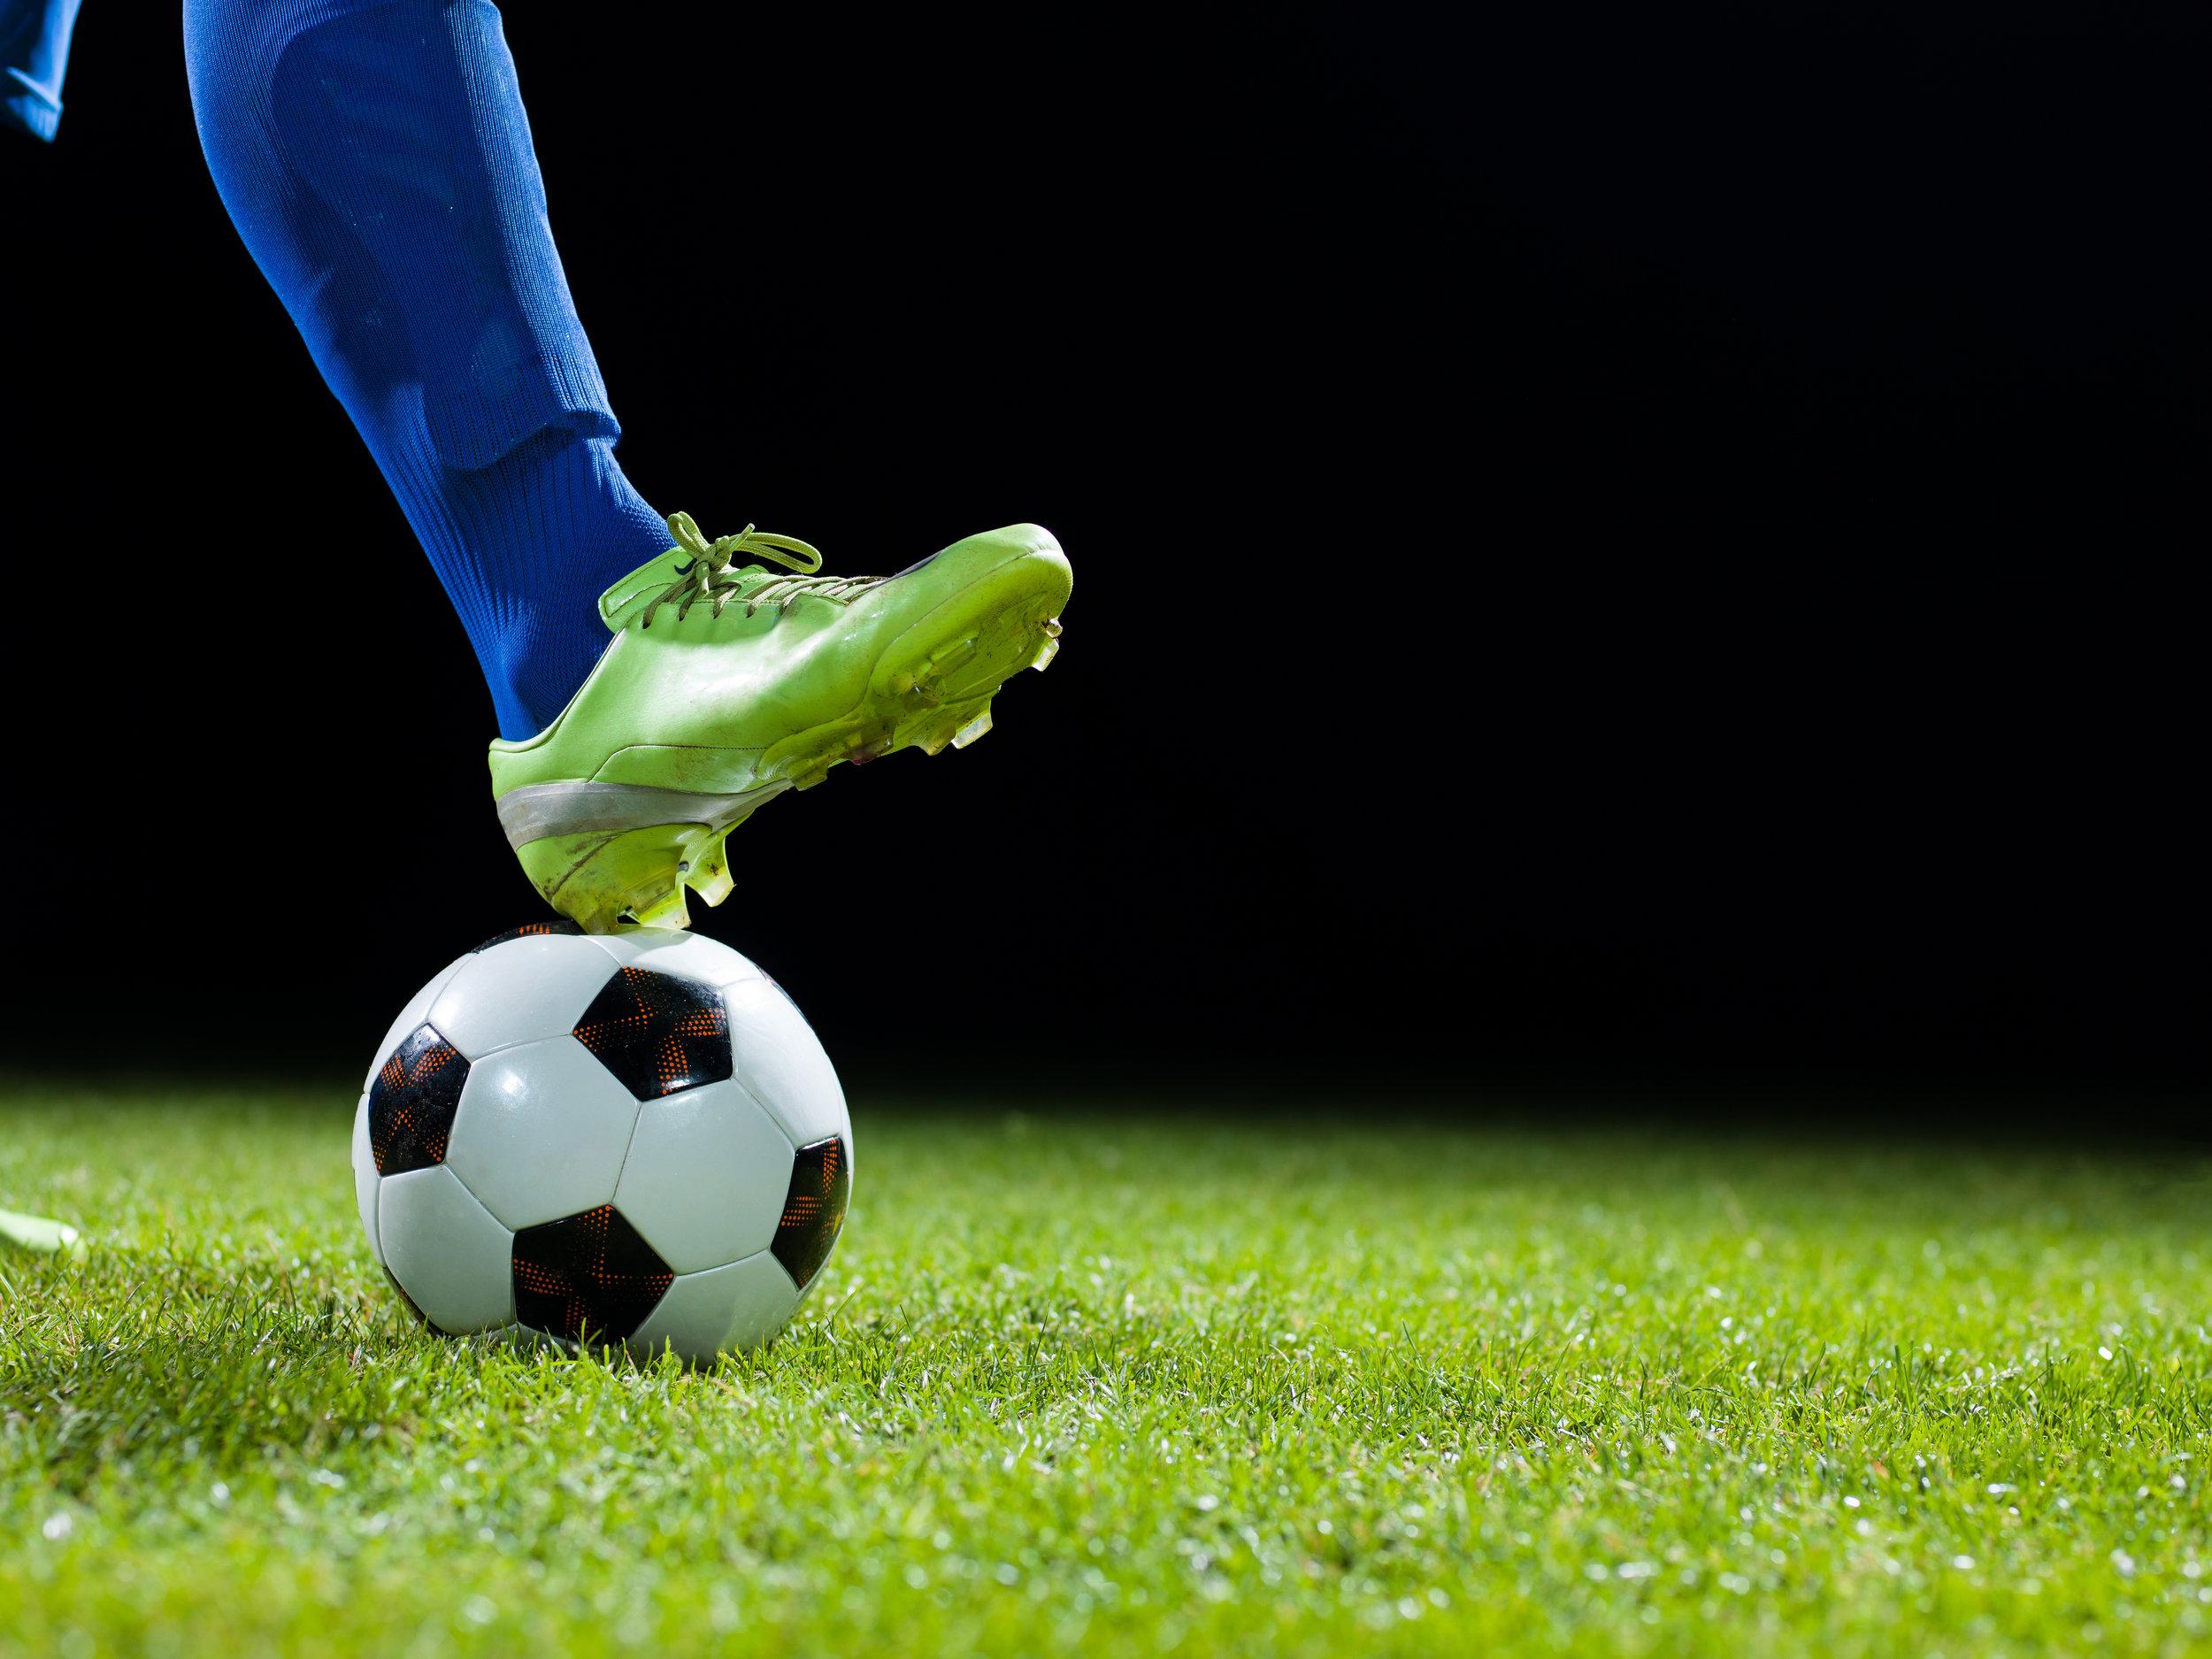 Soccer Player - a0029175-432.jpg